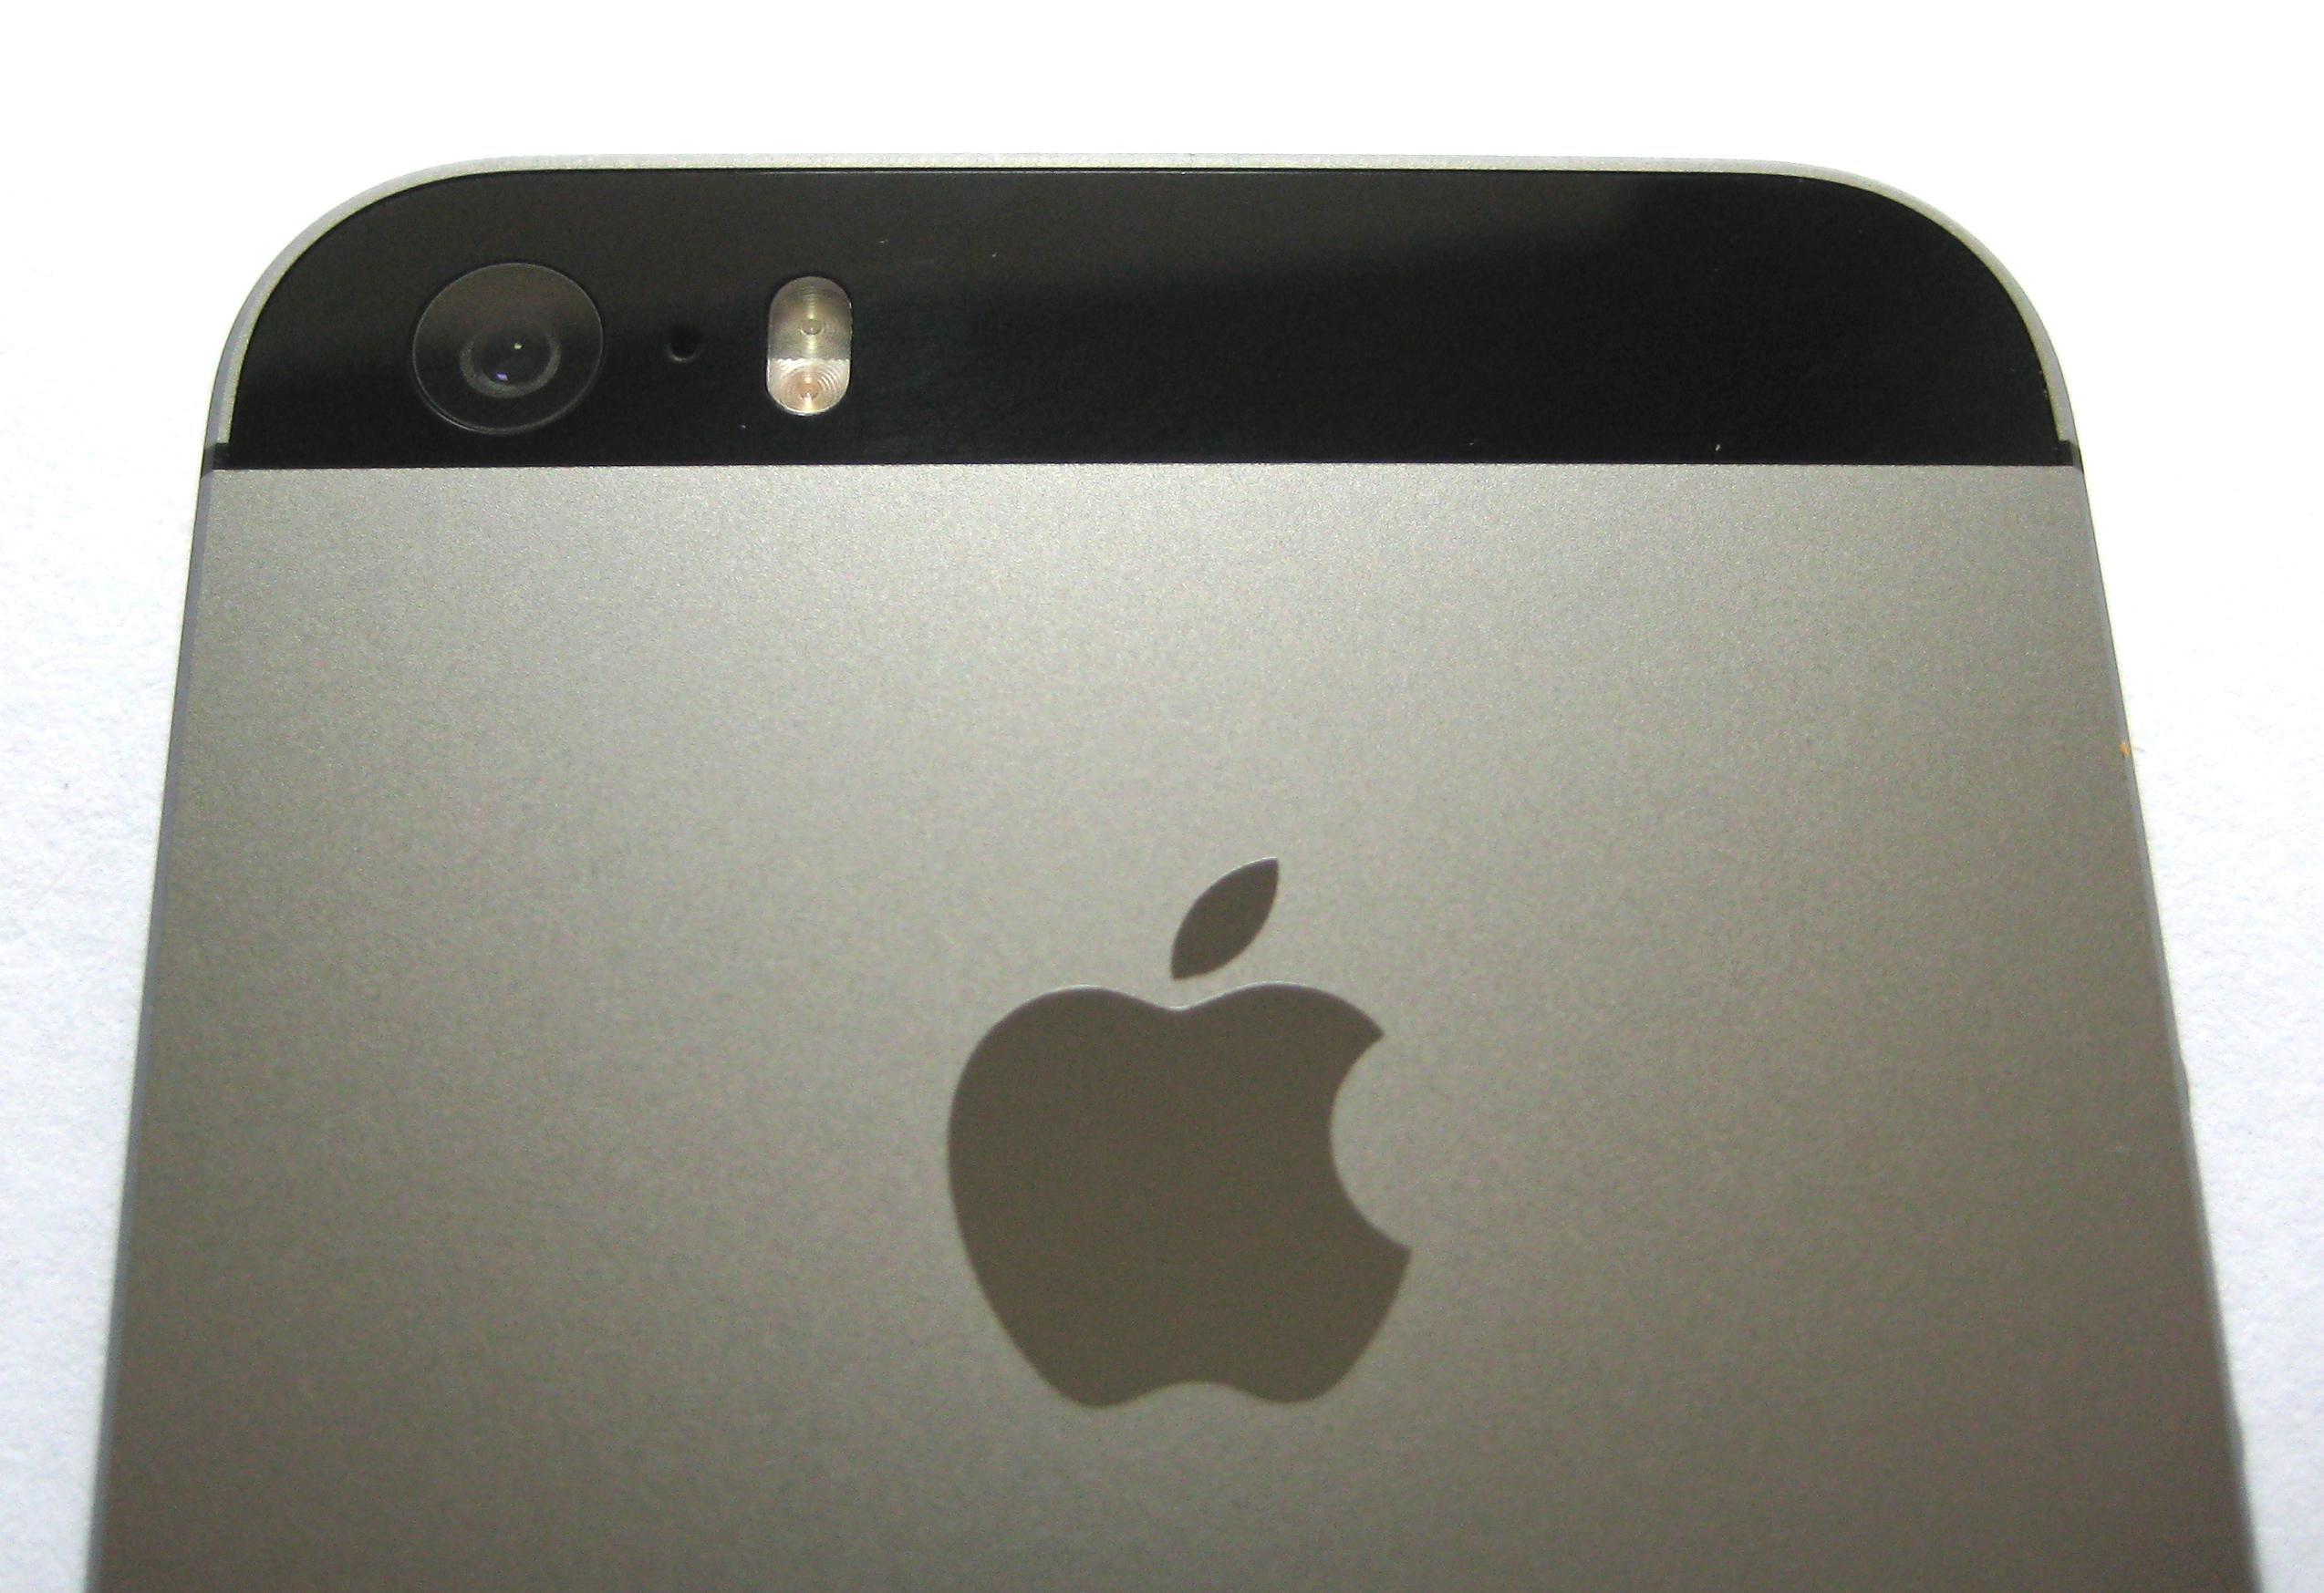 Kameralinse Iphone